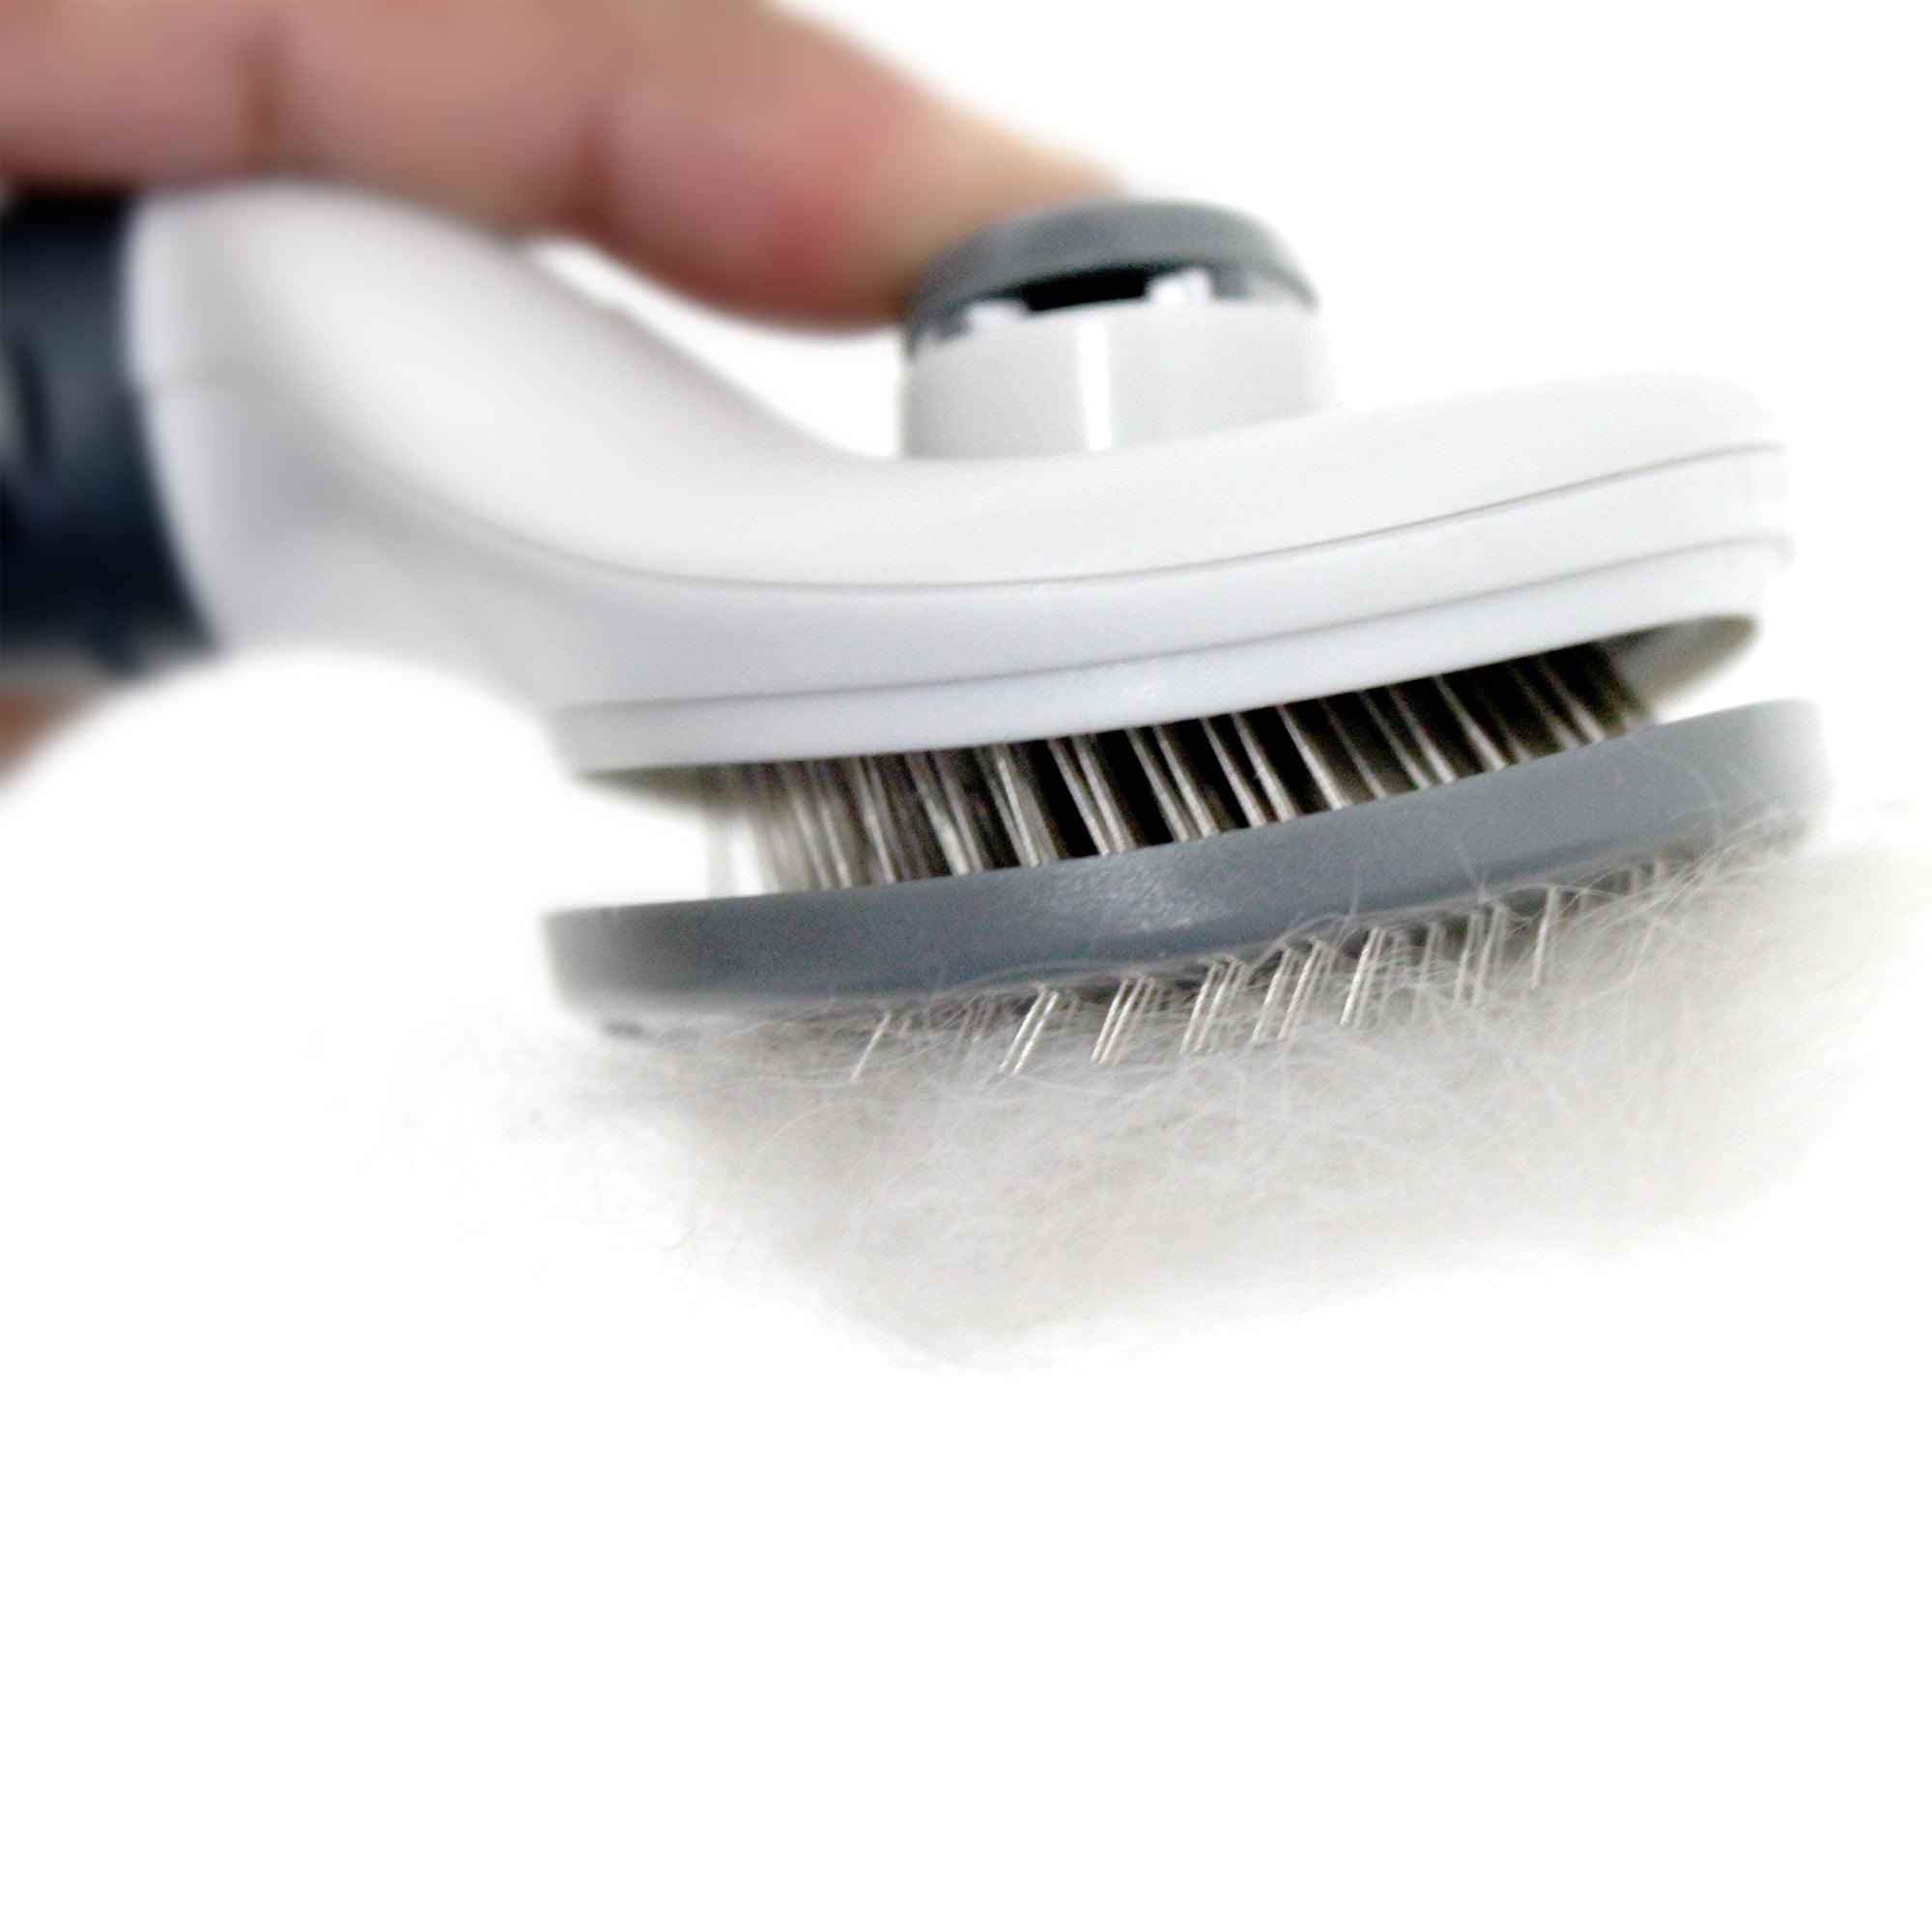 Spetacular Dog Self-Cleaning Slicker Brush, Large - Walmart.com